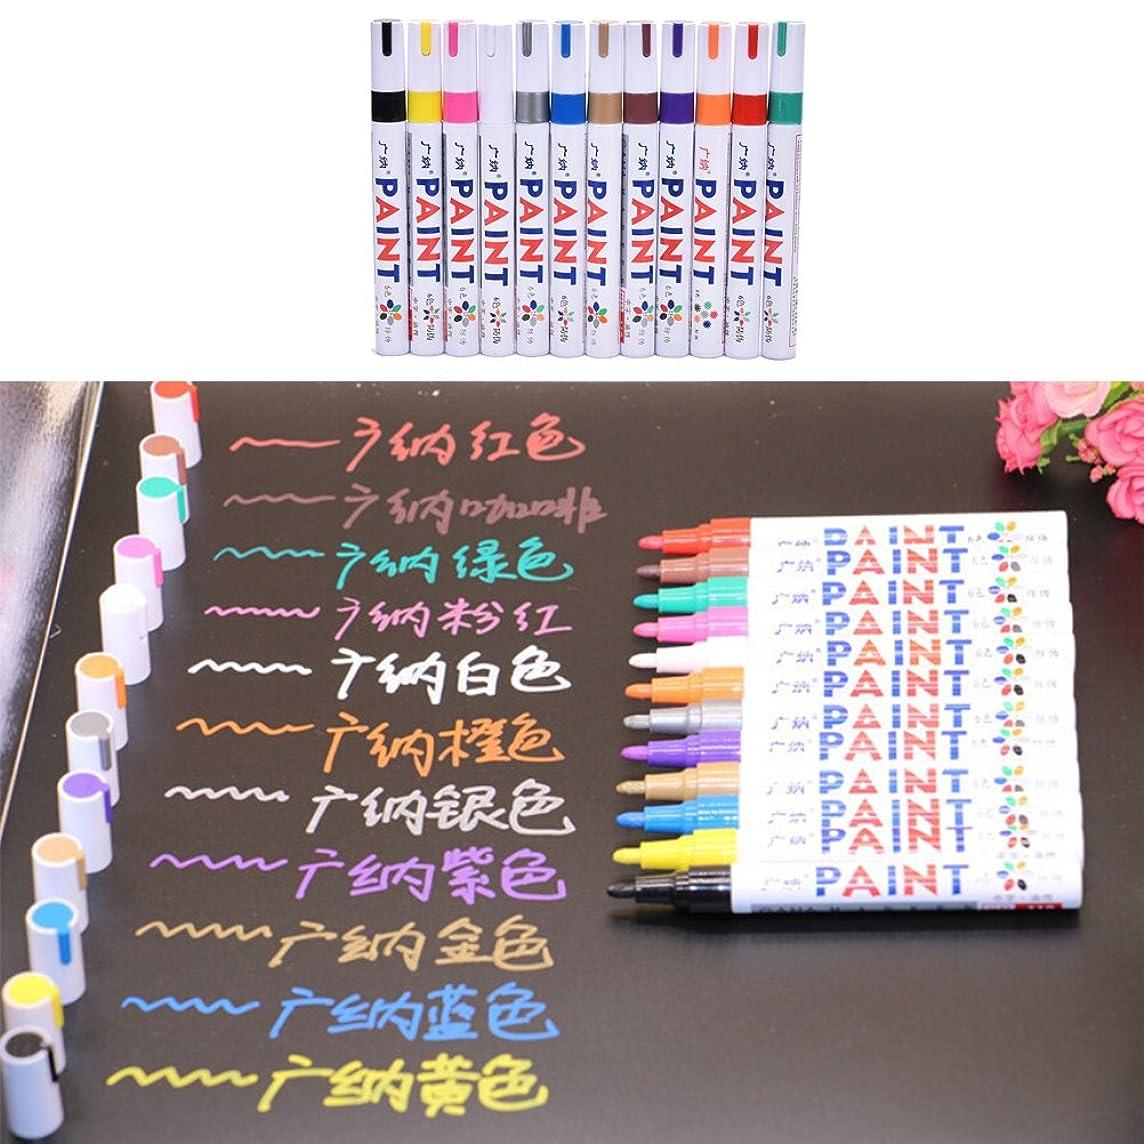 OBELLA BOUTIQUE 1pcs 12 Colors Colorful Marker Pen For CD Ceramic Glass Plastic Wood Paper Paint Marker Caneta Escolar Office School Supplies